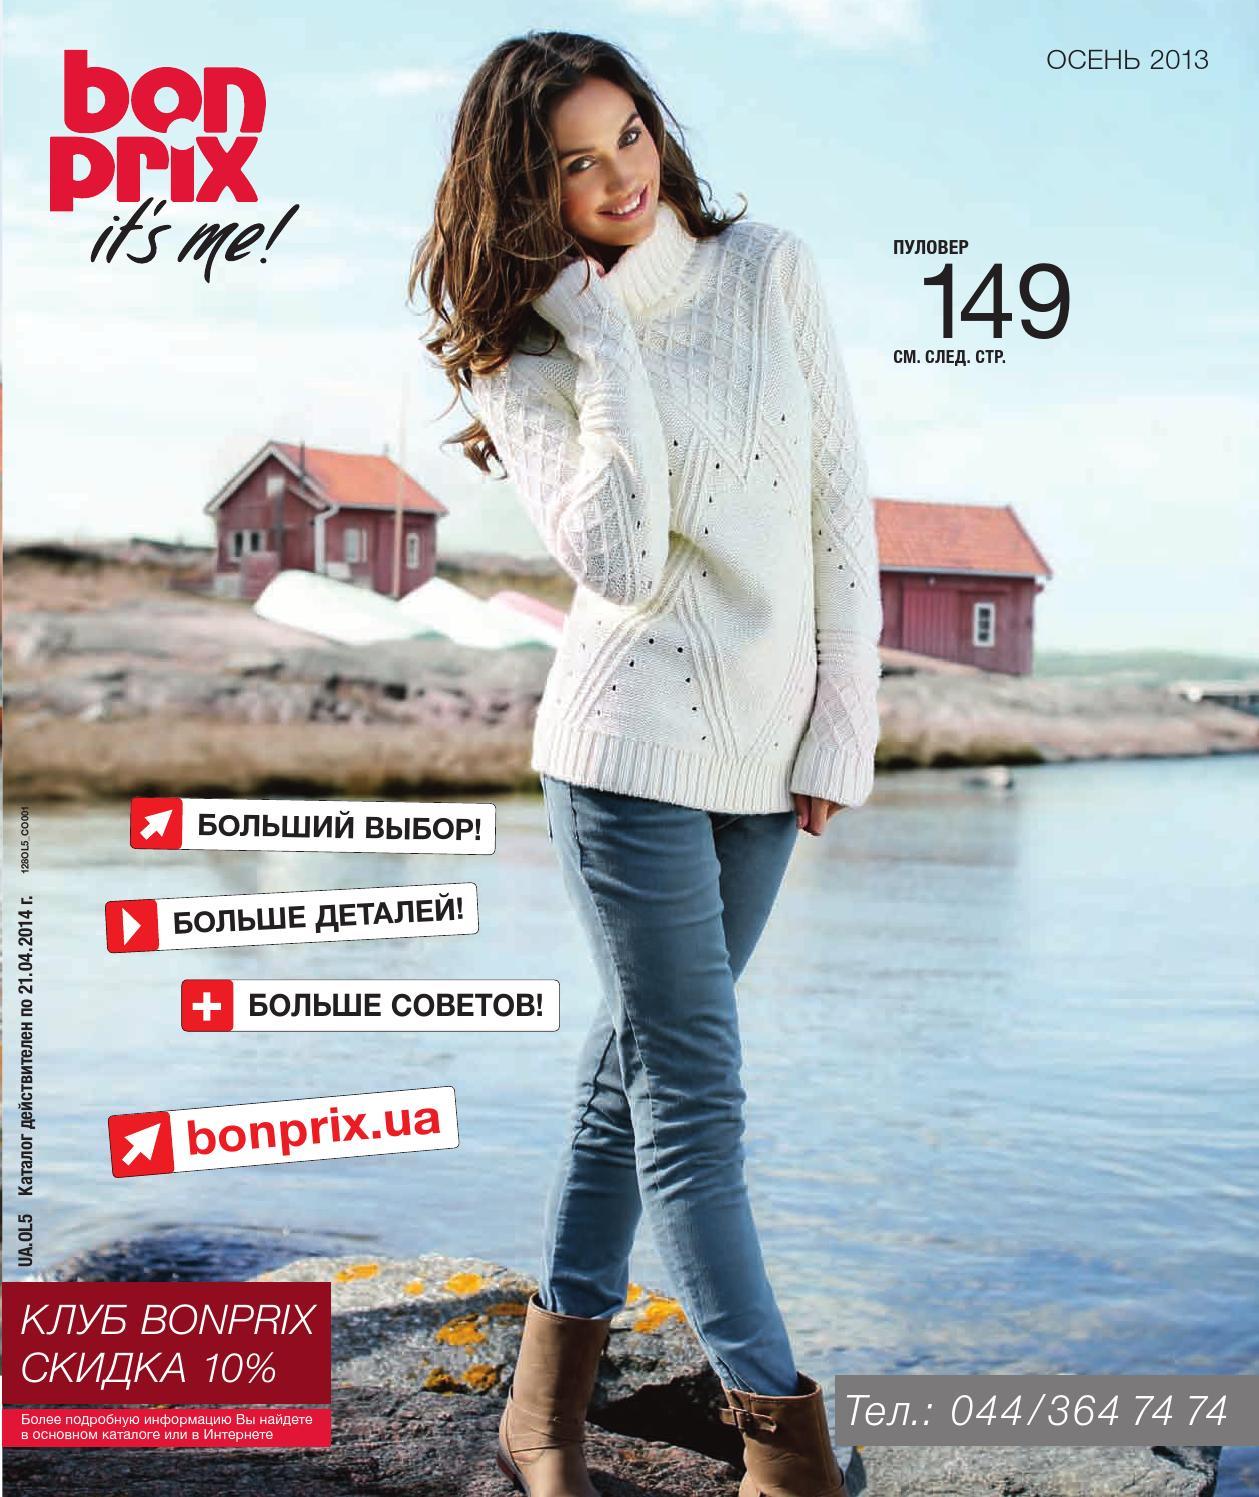 cbe26d970922ba5 B osen zima 2013 actualnie trendi by Sergey Ivanovich - issuu